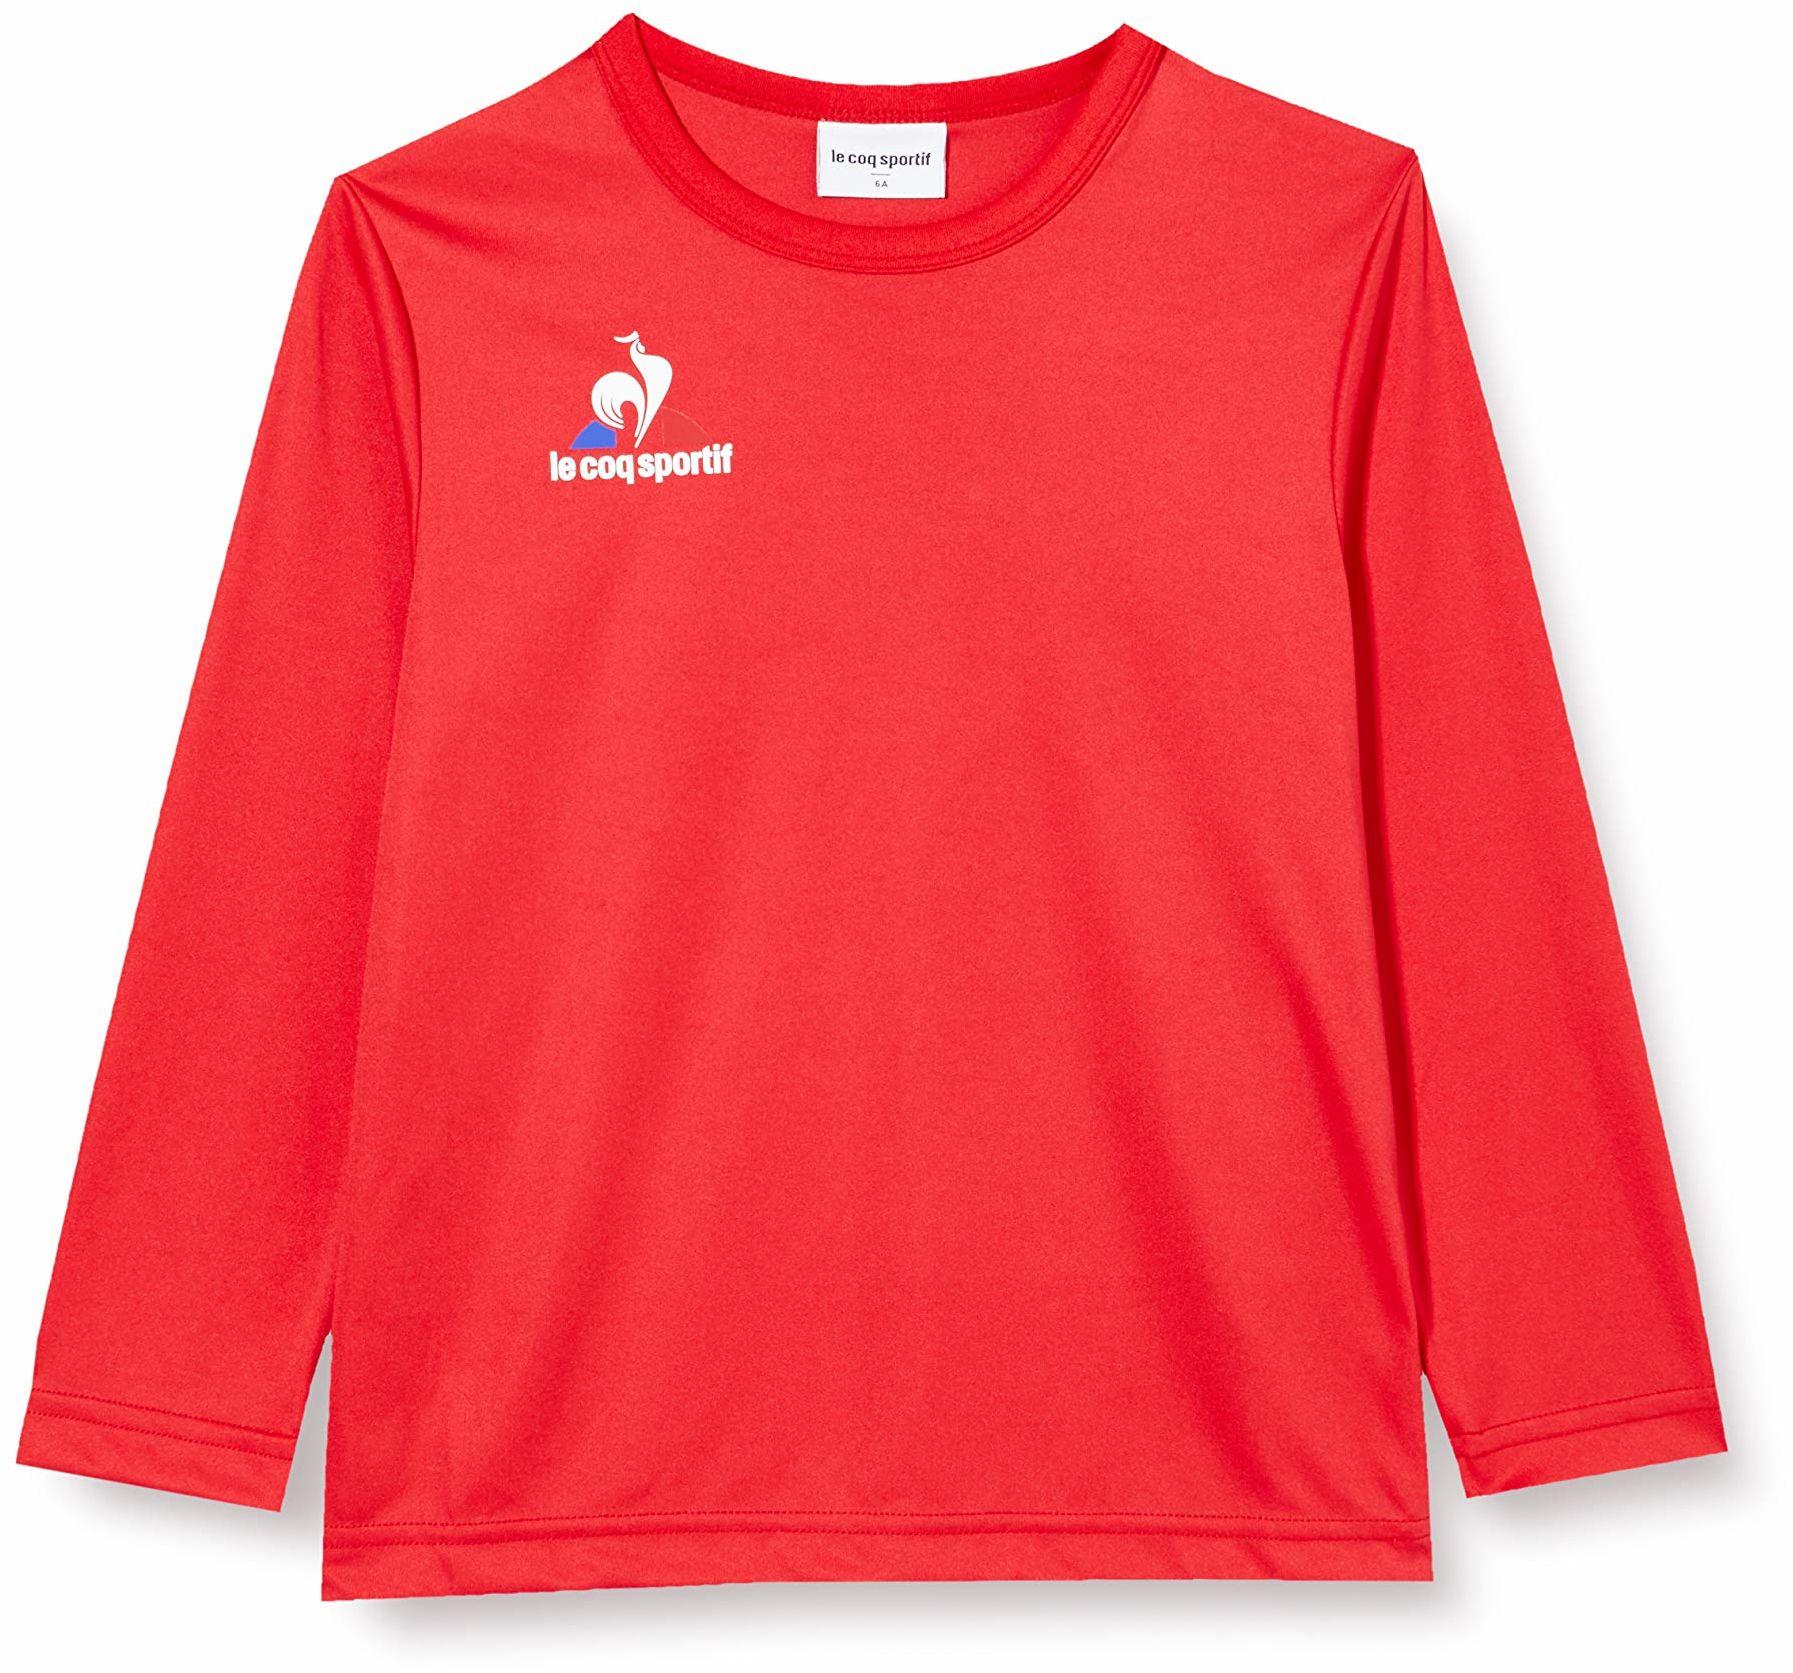 Le Coq Sportif N 1 Maillot Match Enfant Ml podkoszulek, czerwony (Vintage Red), 12A